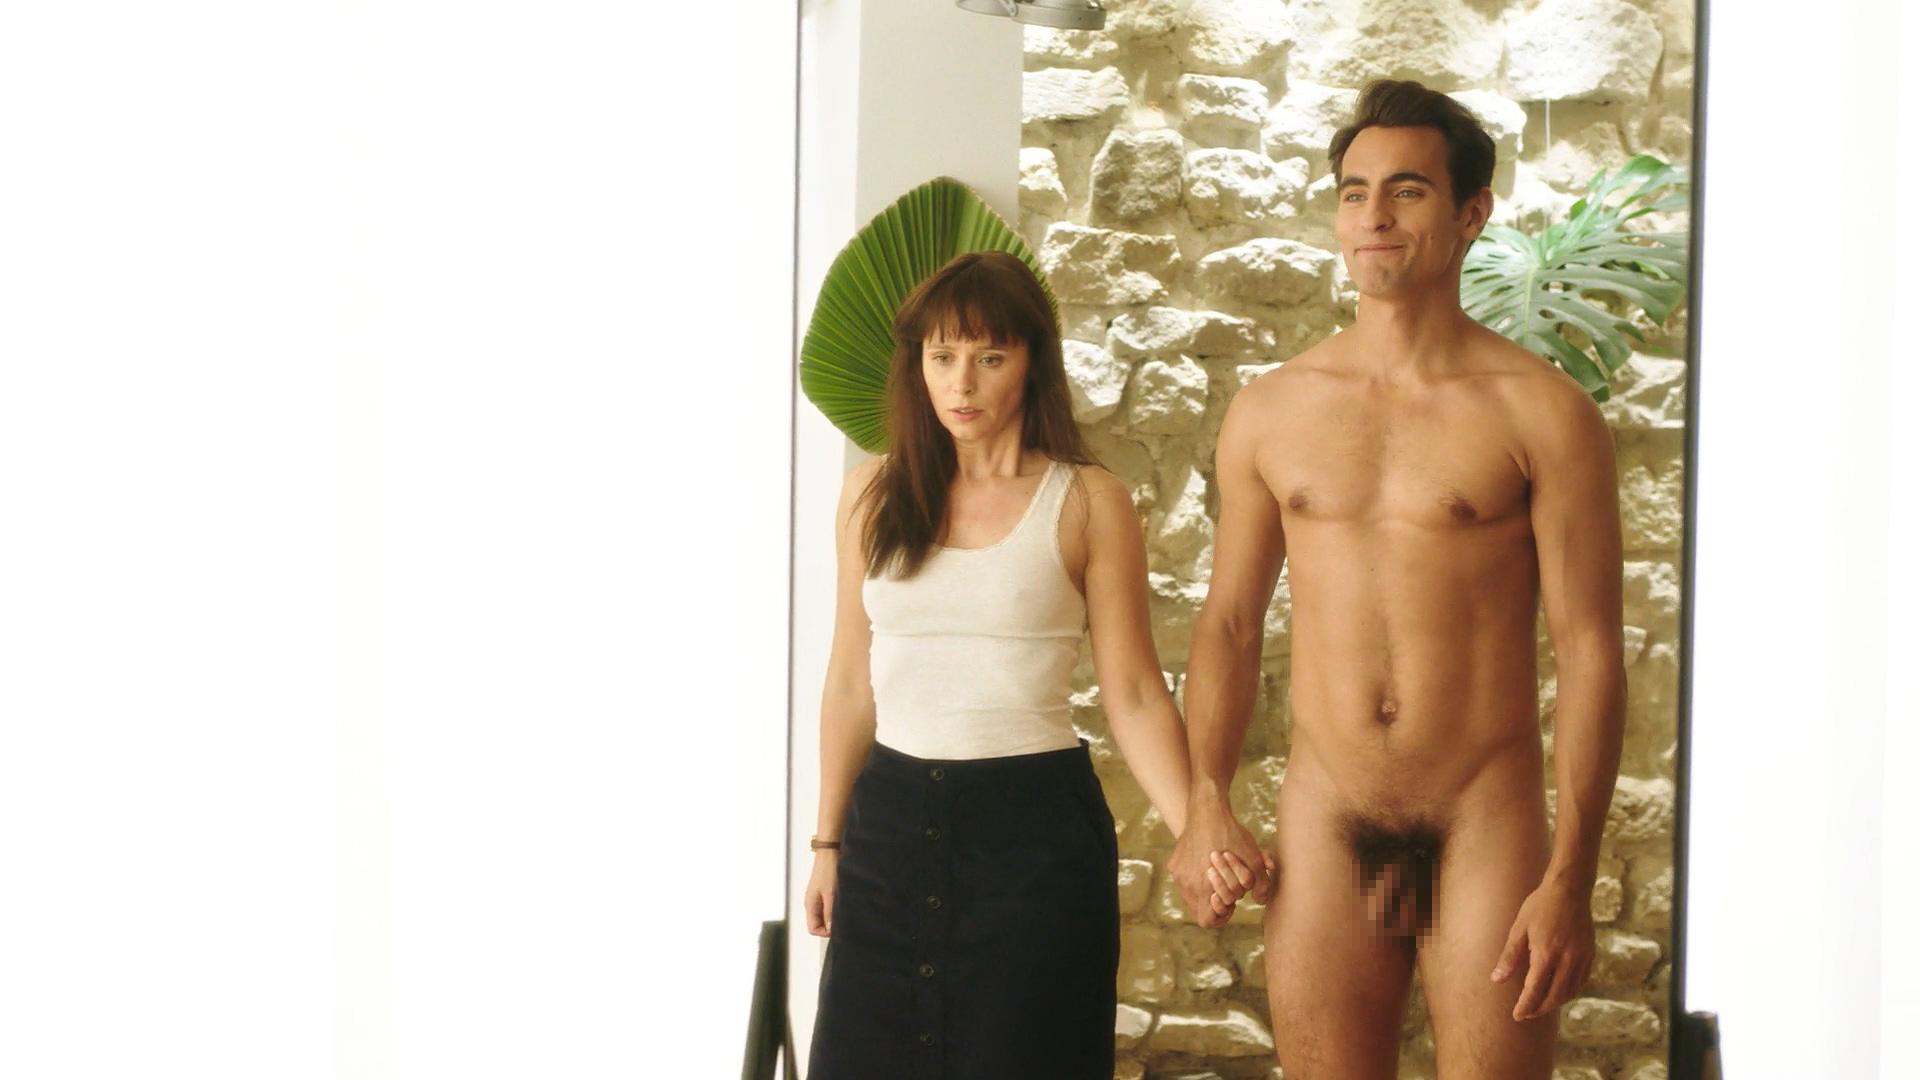 sex-bravo-tv-nudity-pictures-tiffany